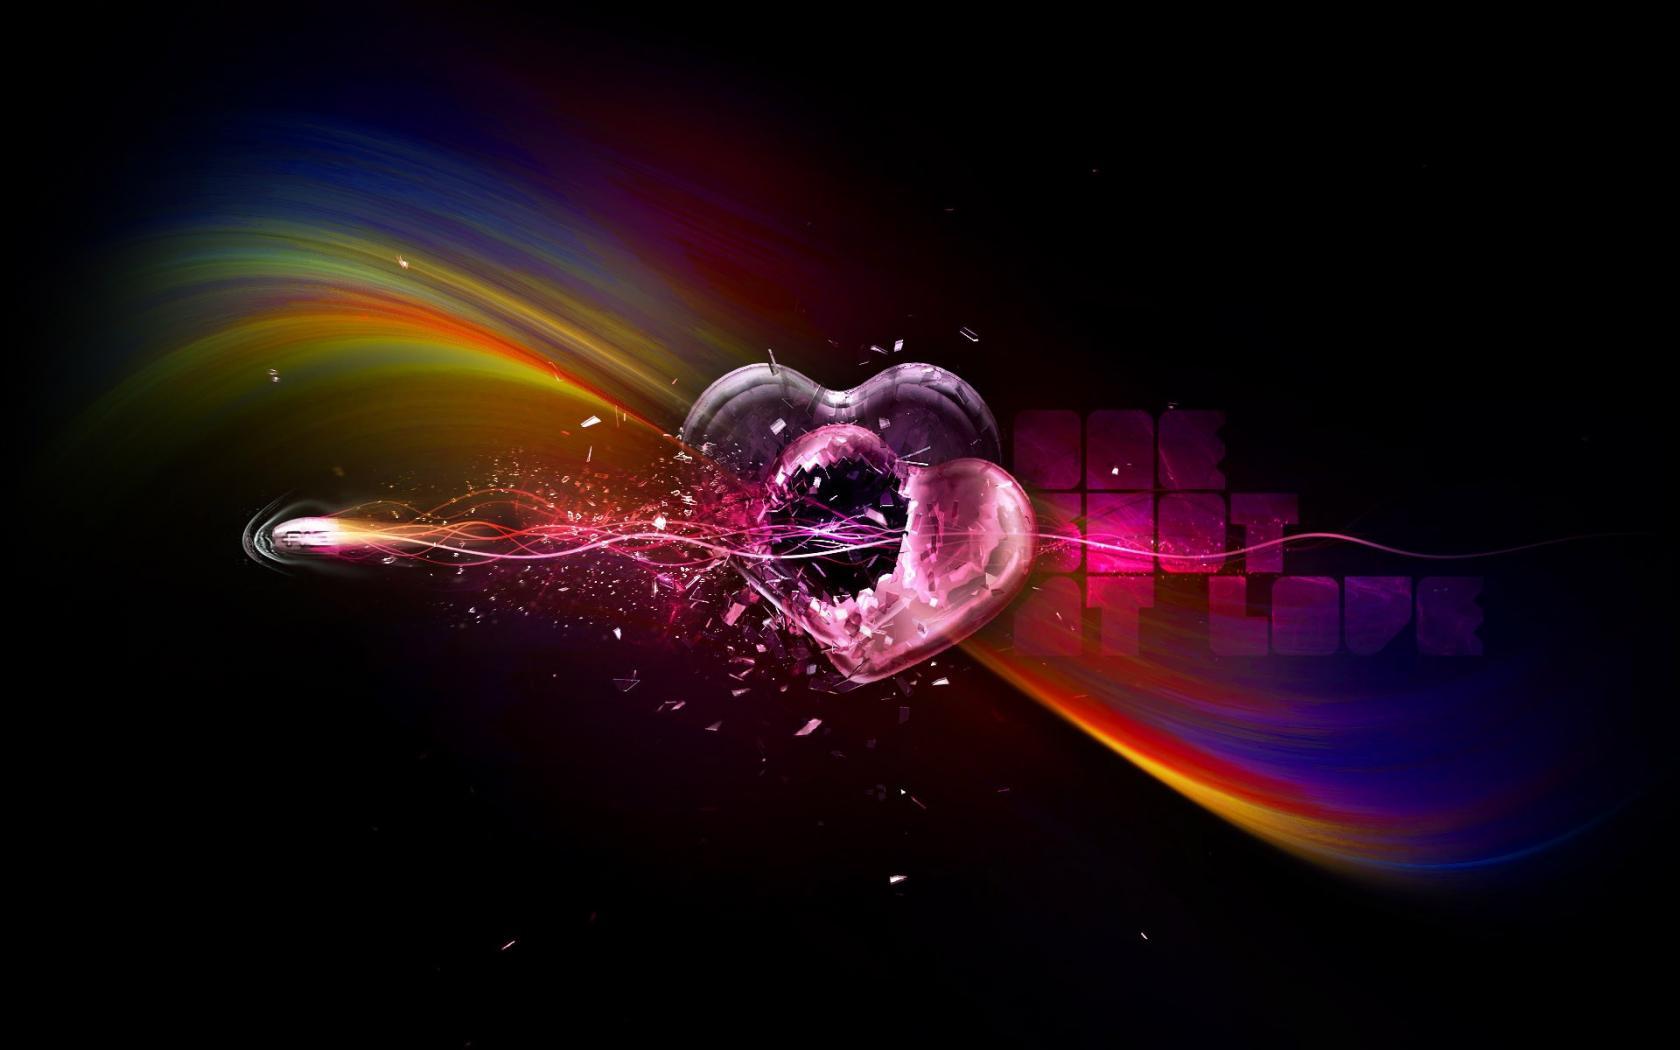 Broken heart wallpapers hd wallpapersafari - Best heart wallpaper hd ...